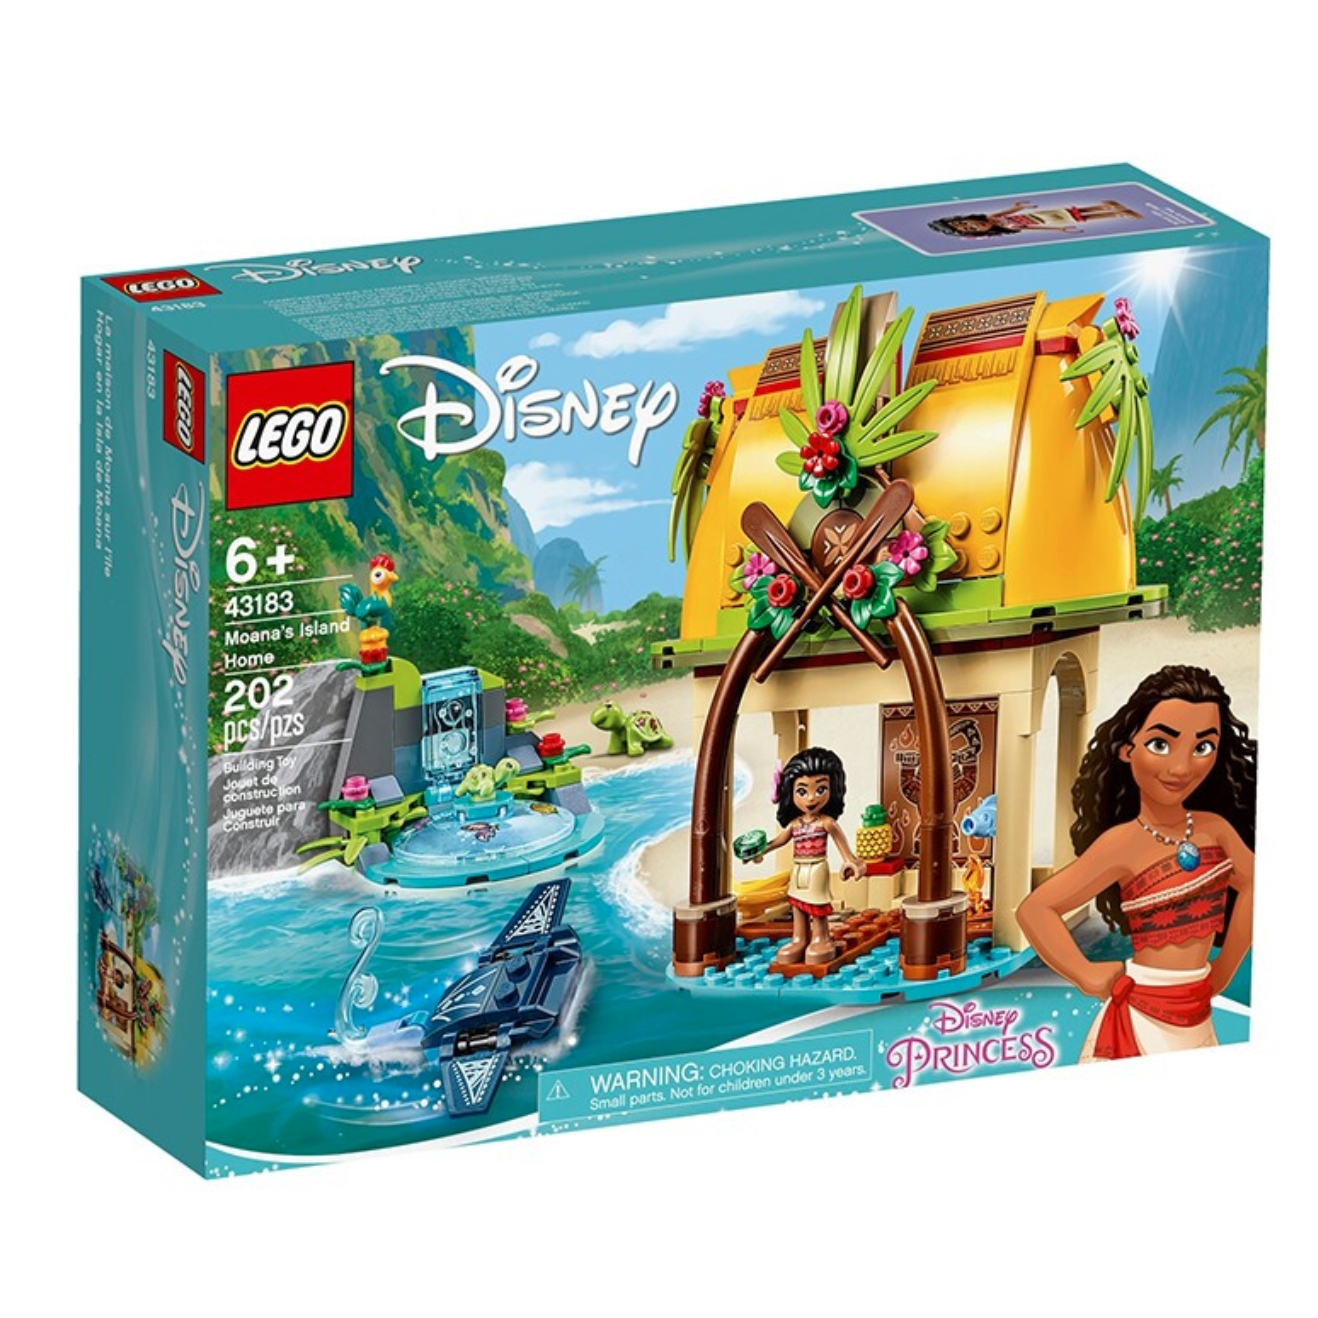 LEGO 乐高 迪士尼系列 43183  莫阿娜的海岛之家